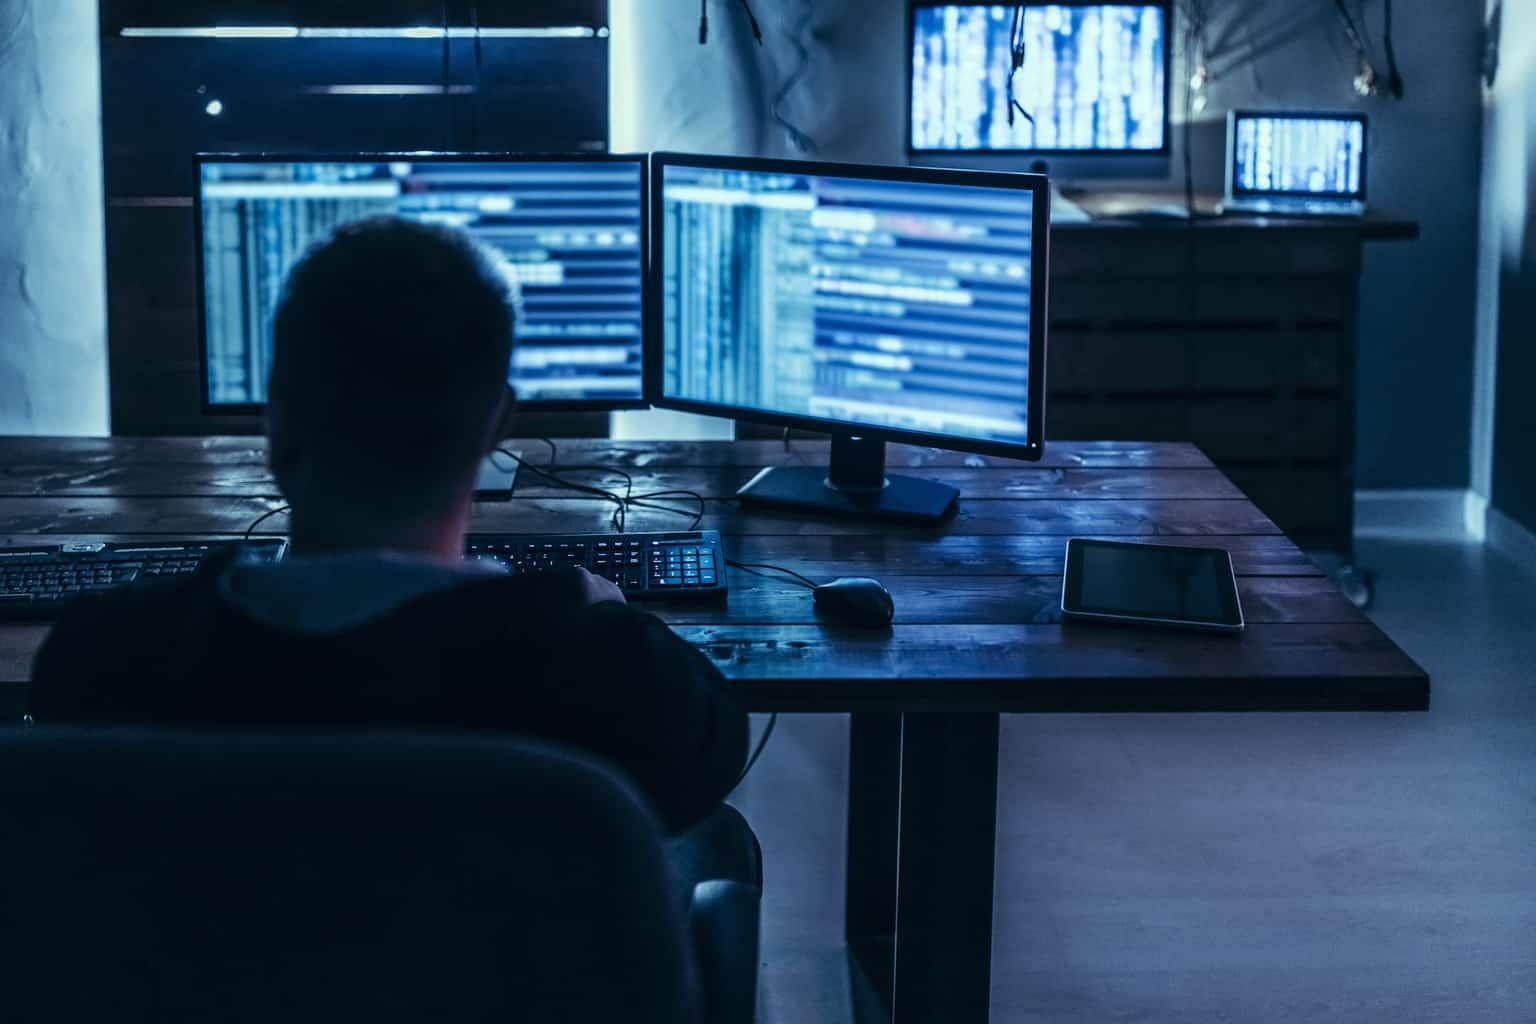 Hacker in deep mind solutions to destroy web